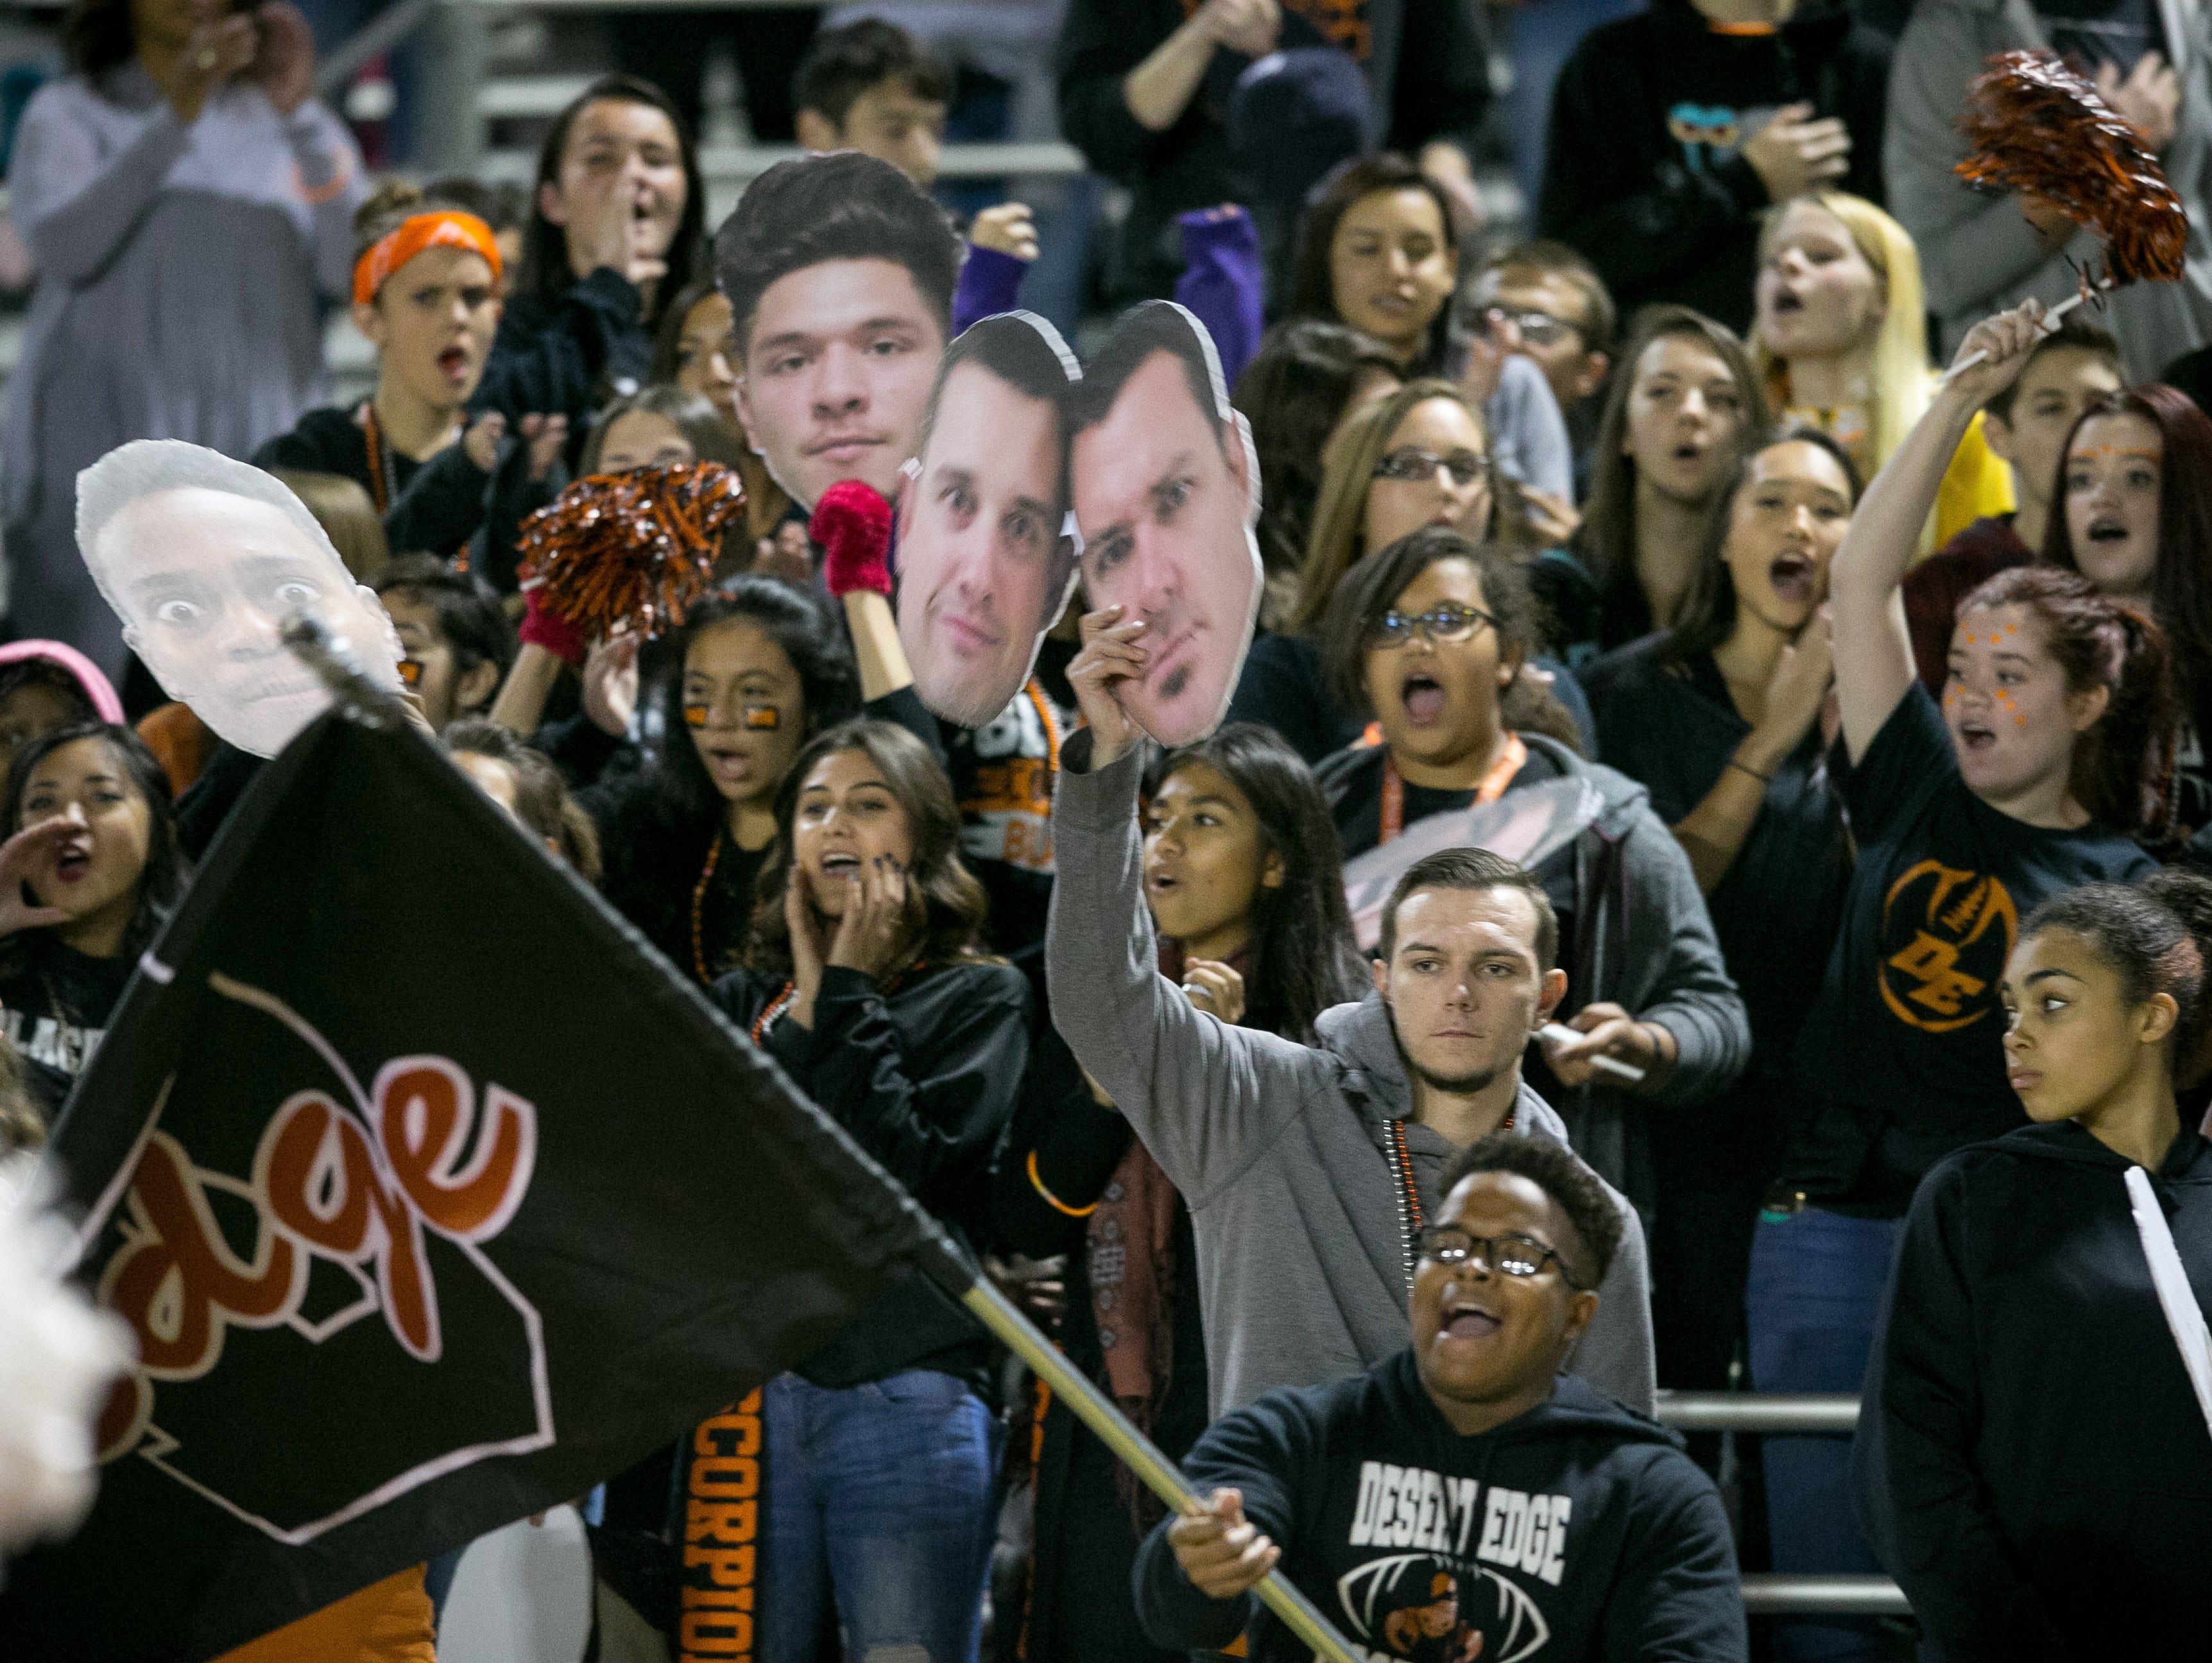 Goodyear Desert Edge fans cheer during their Division III high school football state semifinals game against Buckeye Verrado in Goodyear on Friday, Nov. 20, 2015.